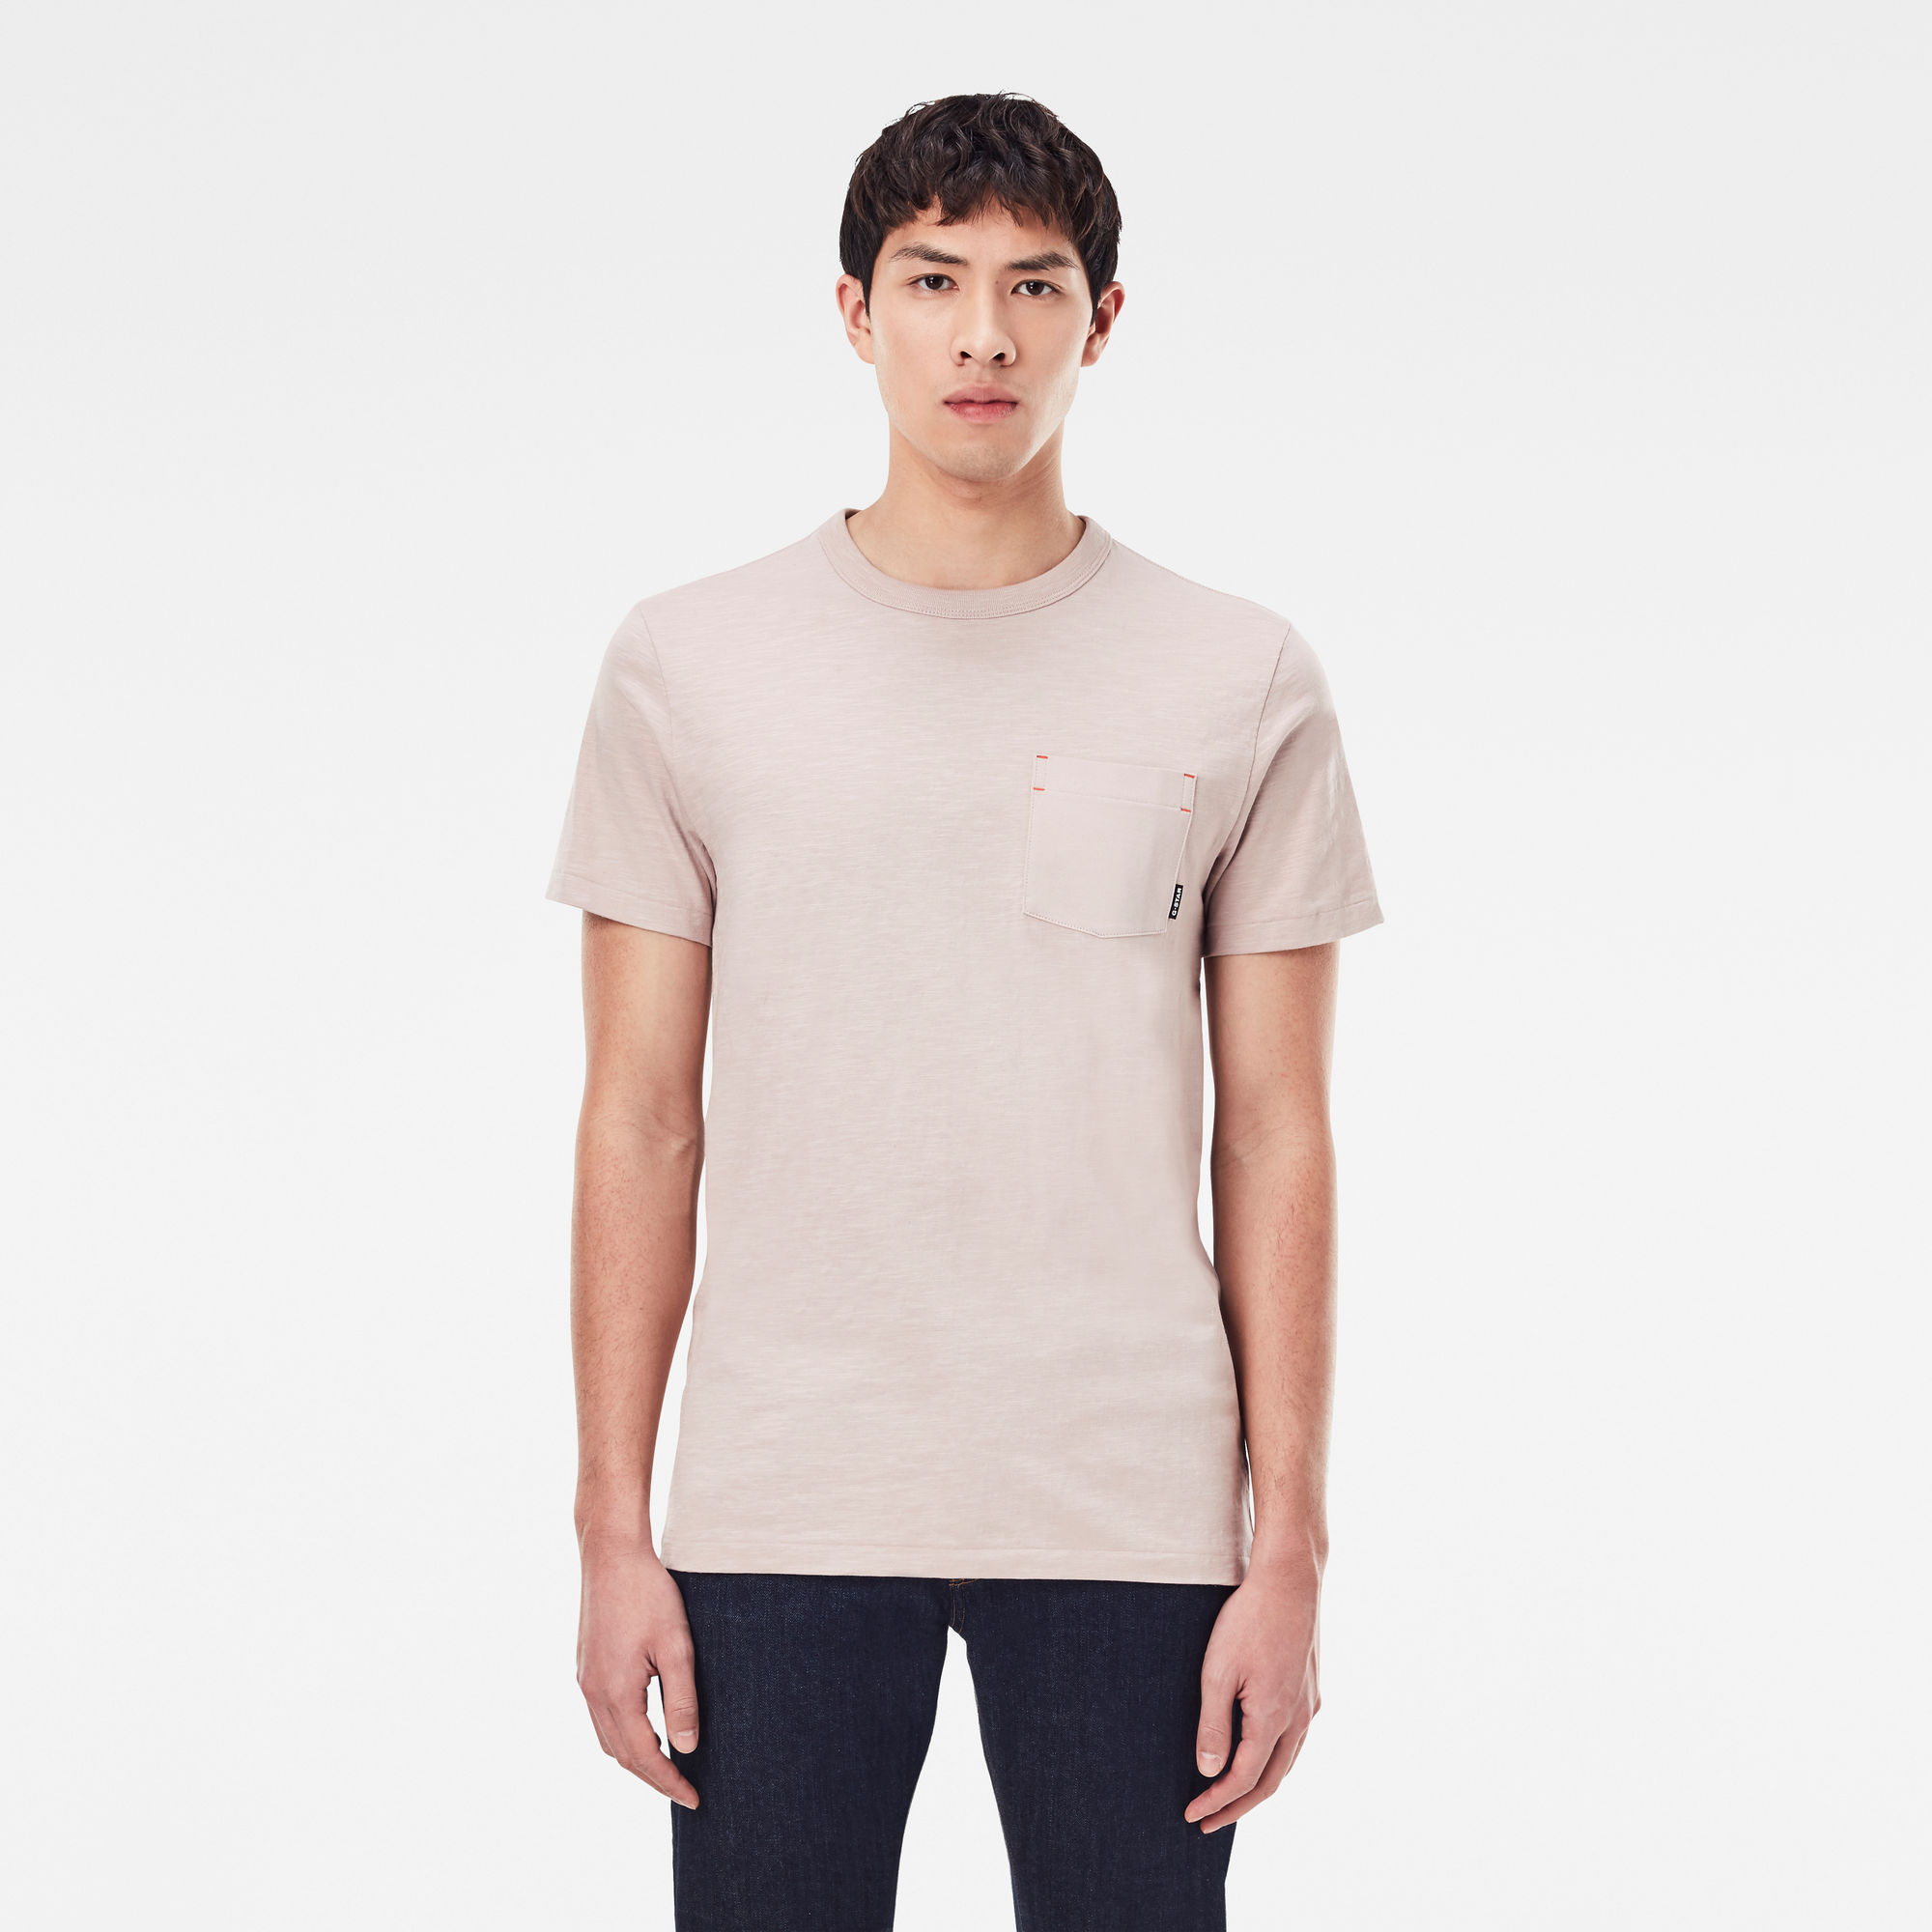 G-Star RAW Heren Contrast Mercerized Pocket T-Shirt Roze